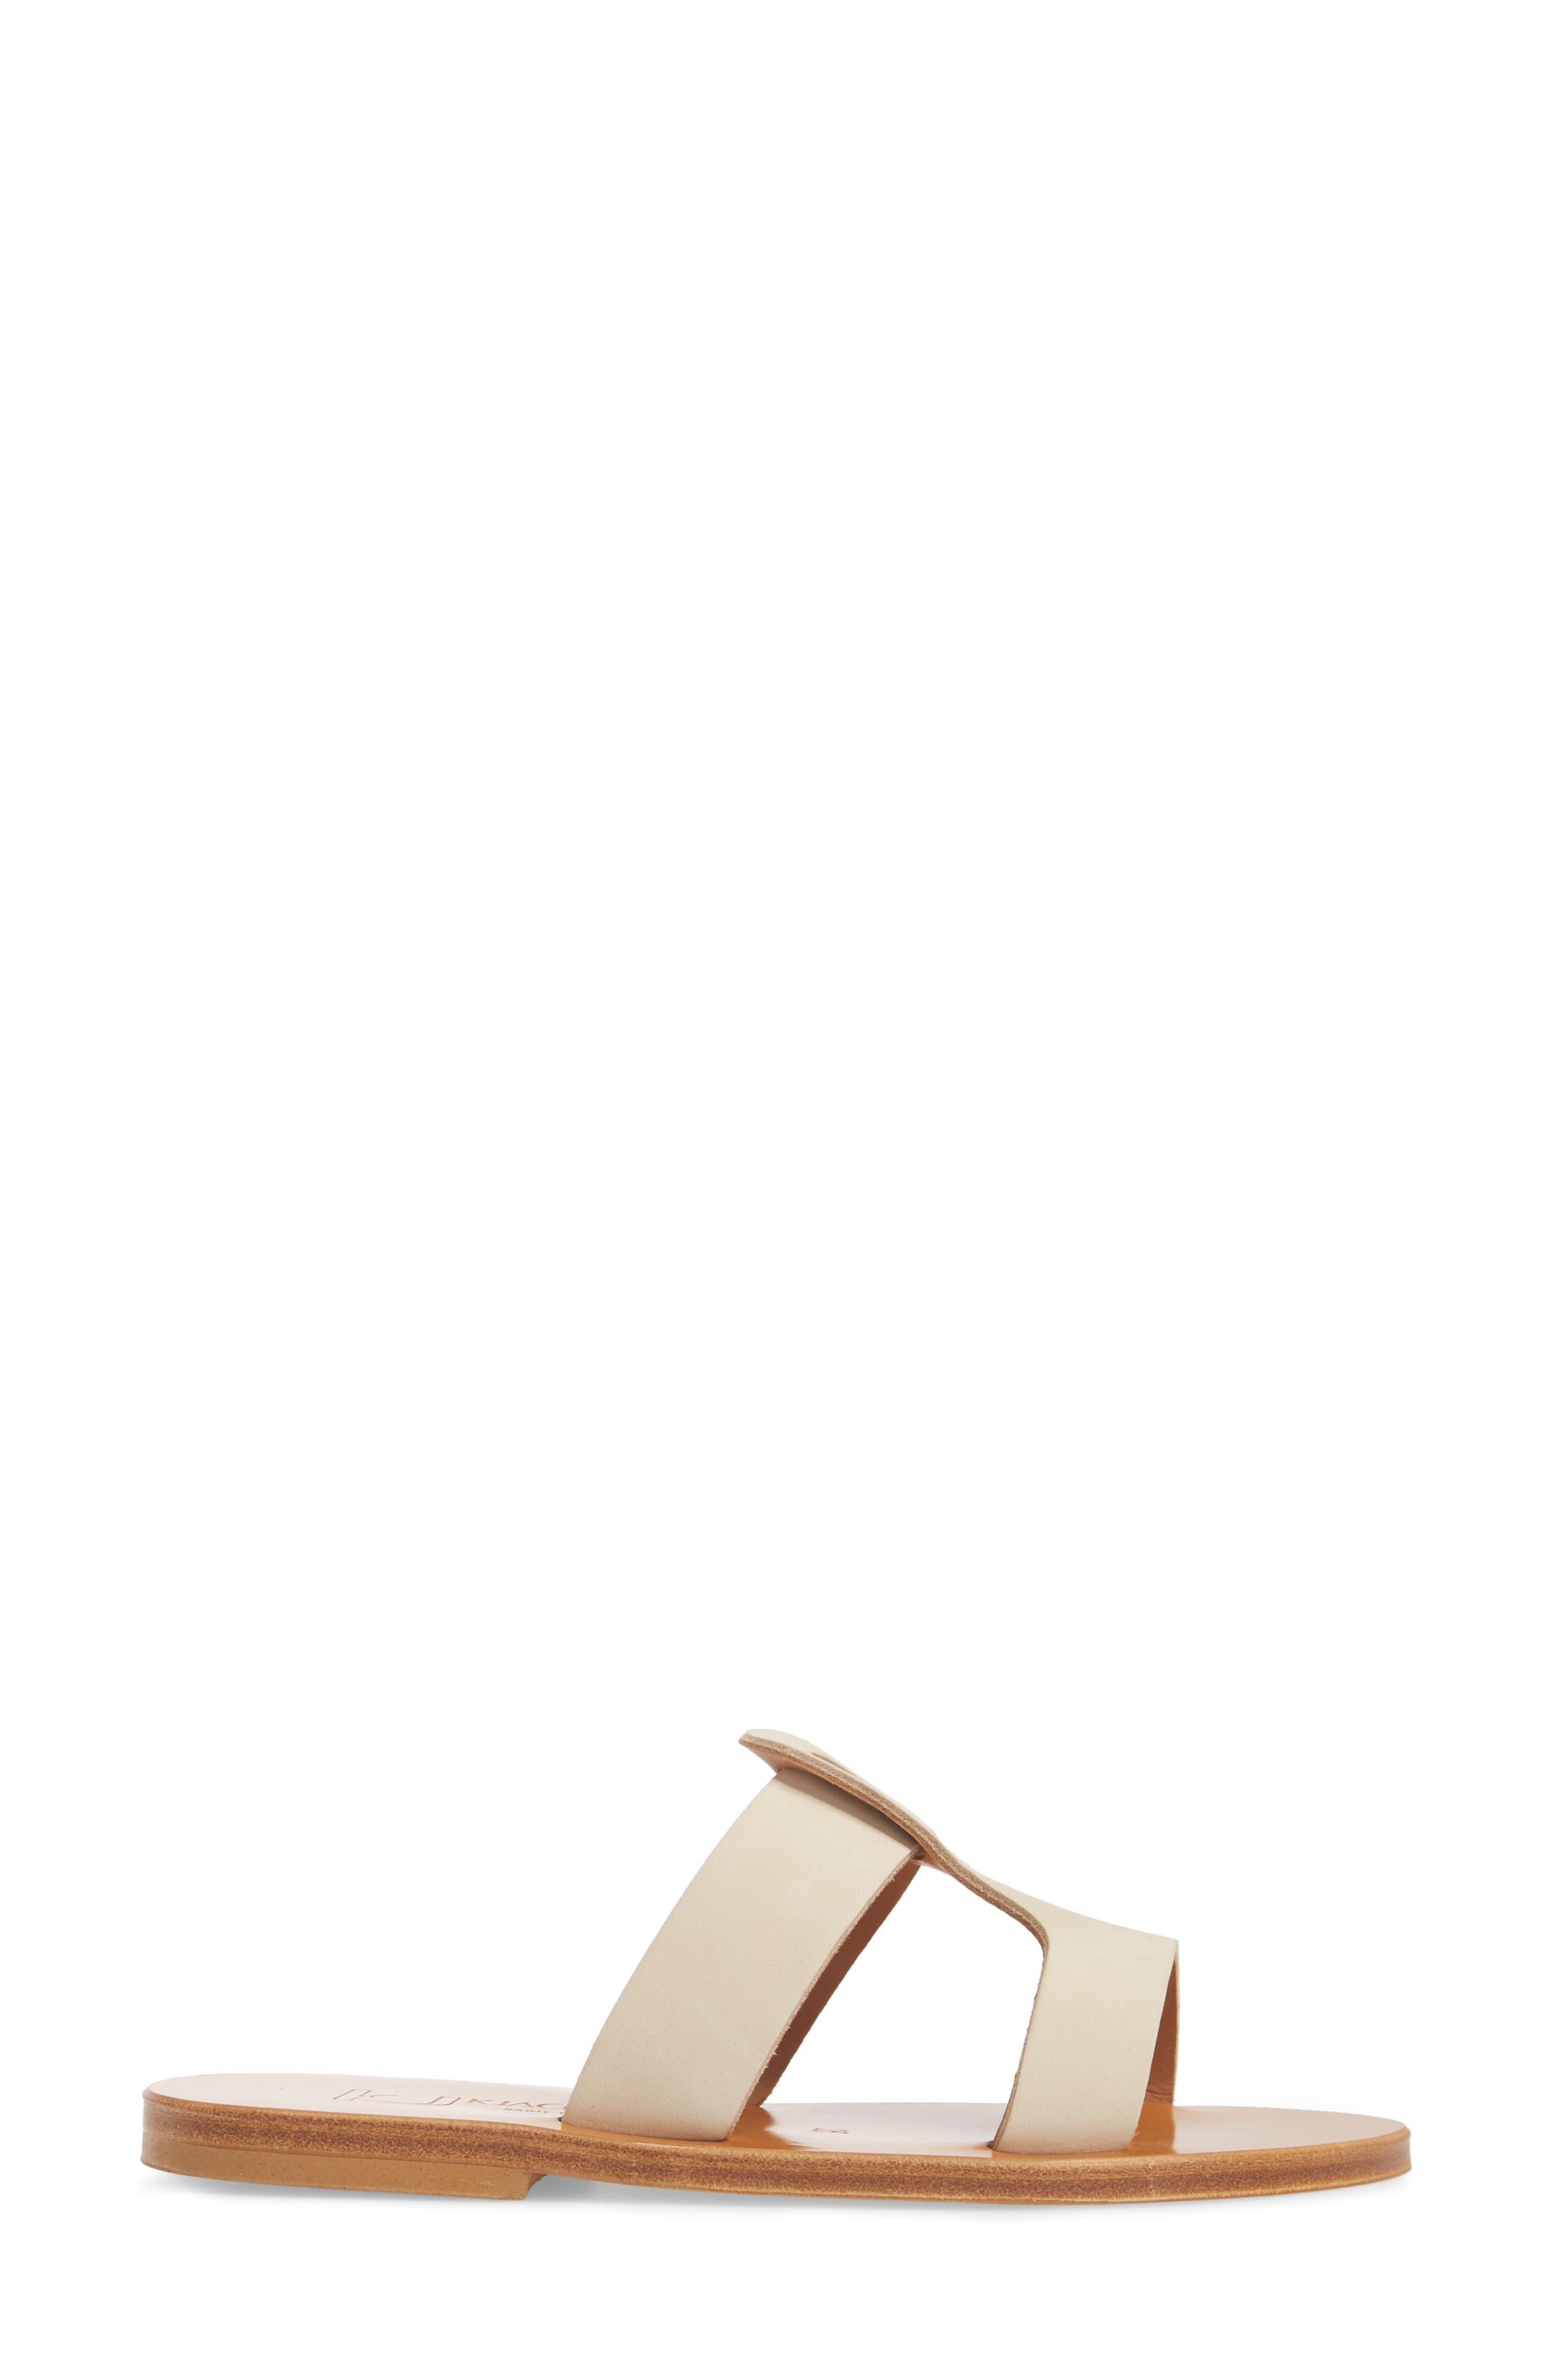 K. Jacques St. Tropez Slide Sandal,                             Alternate thumbnail 6, color,